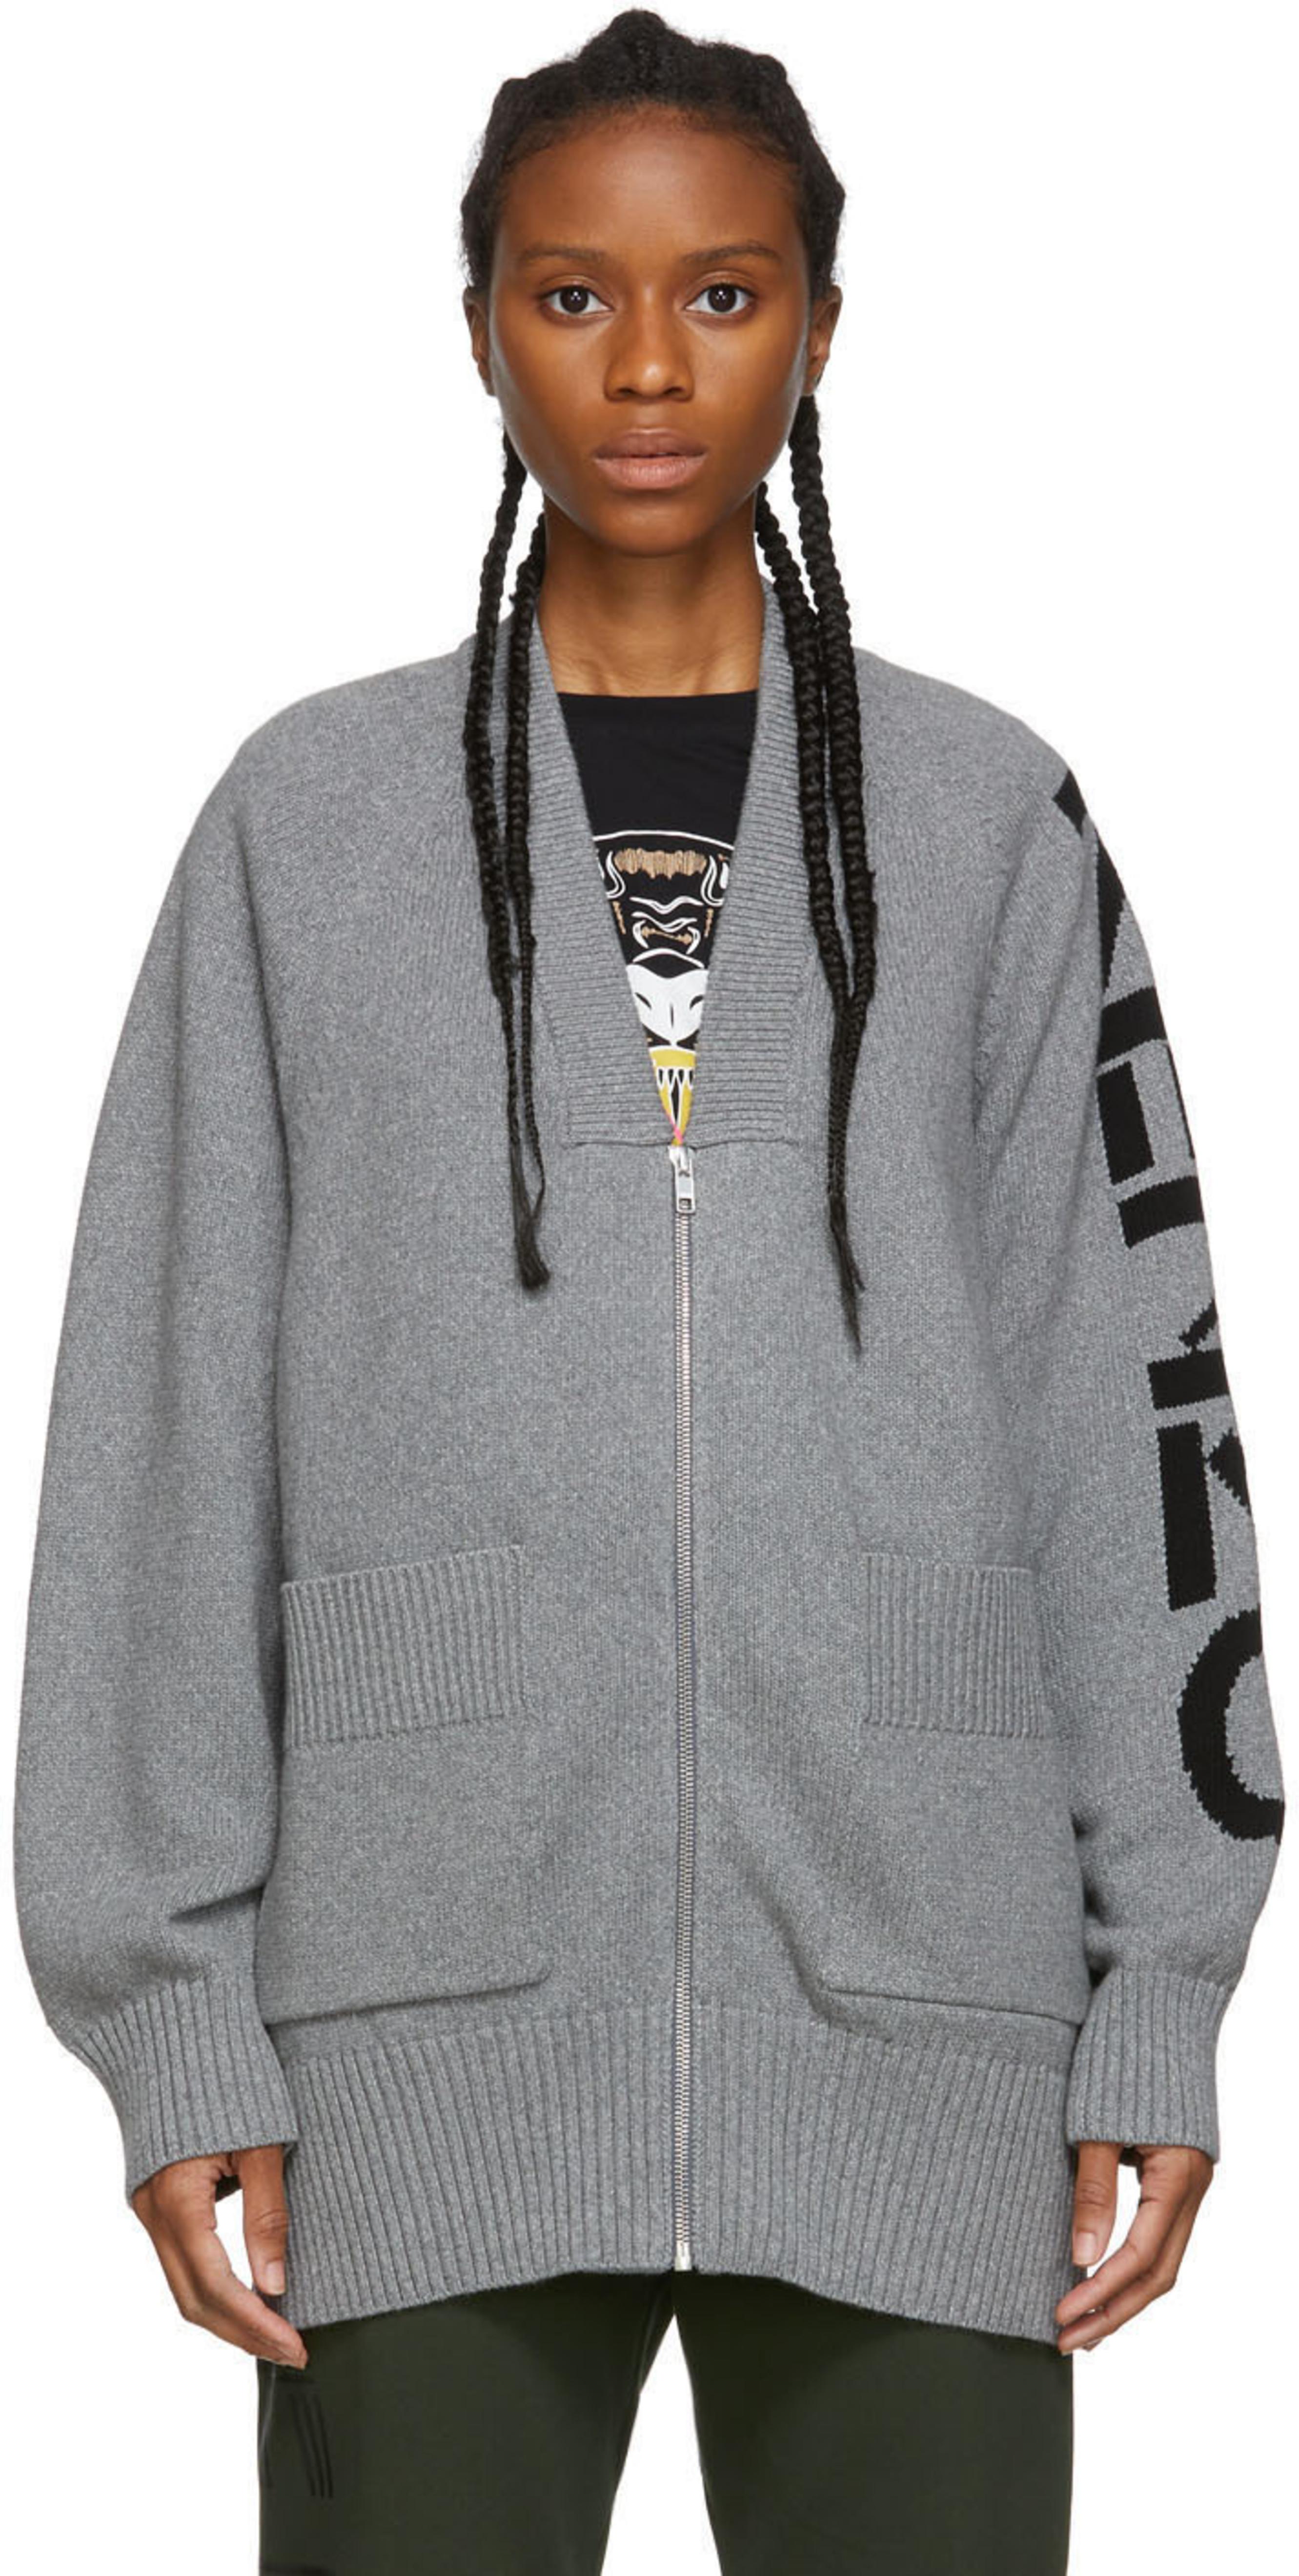 24d021f2 Grey Sport Zipped Cardigan